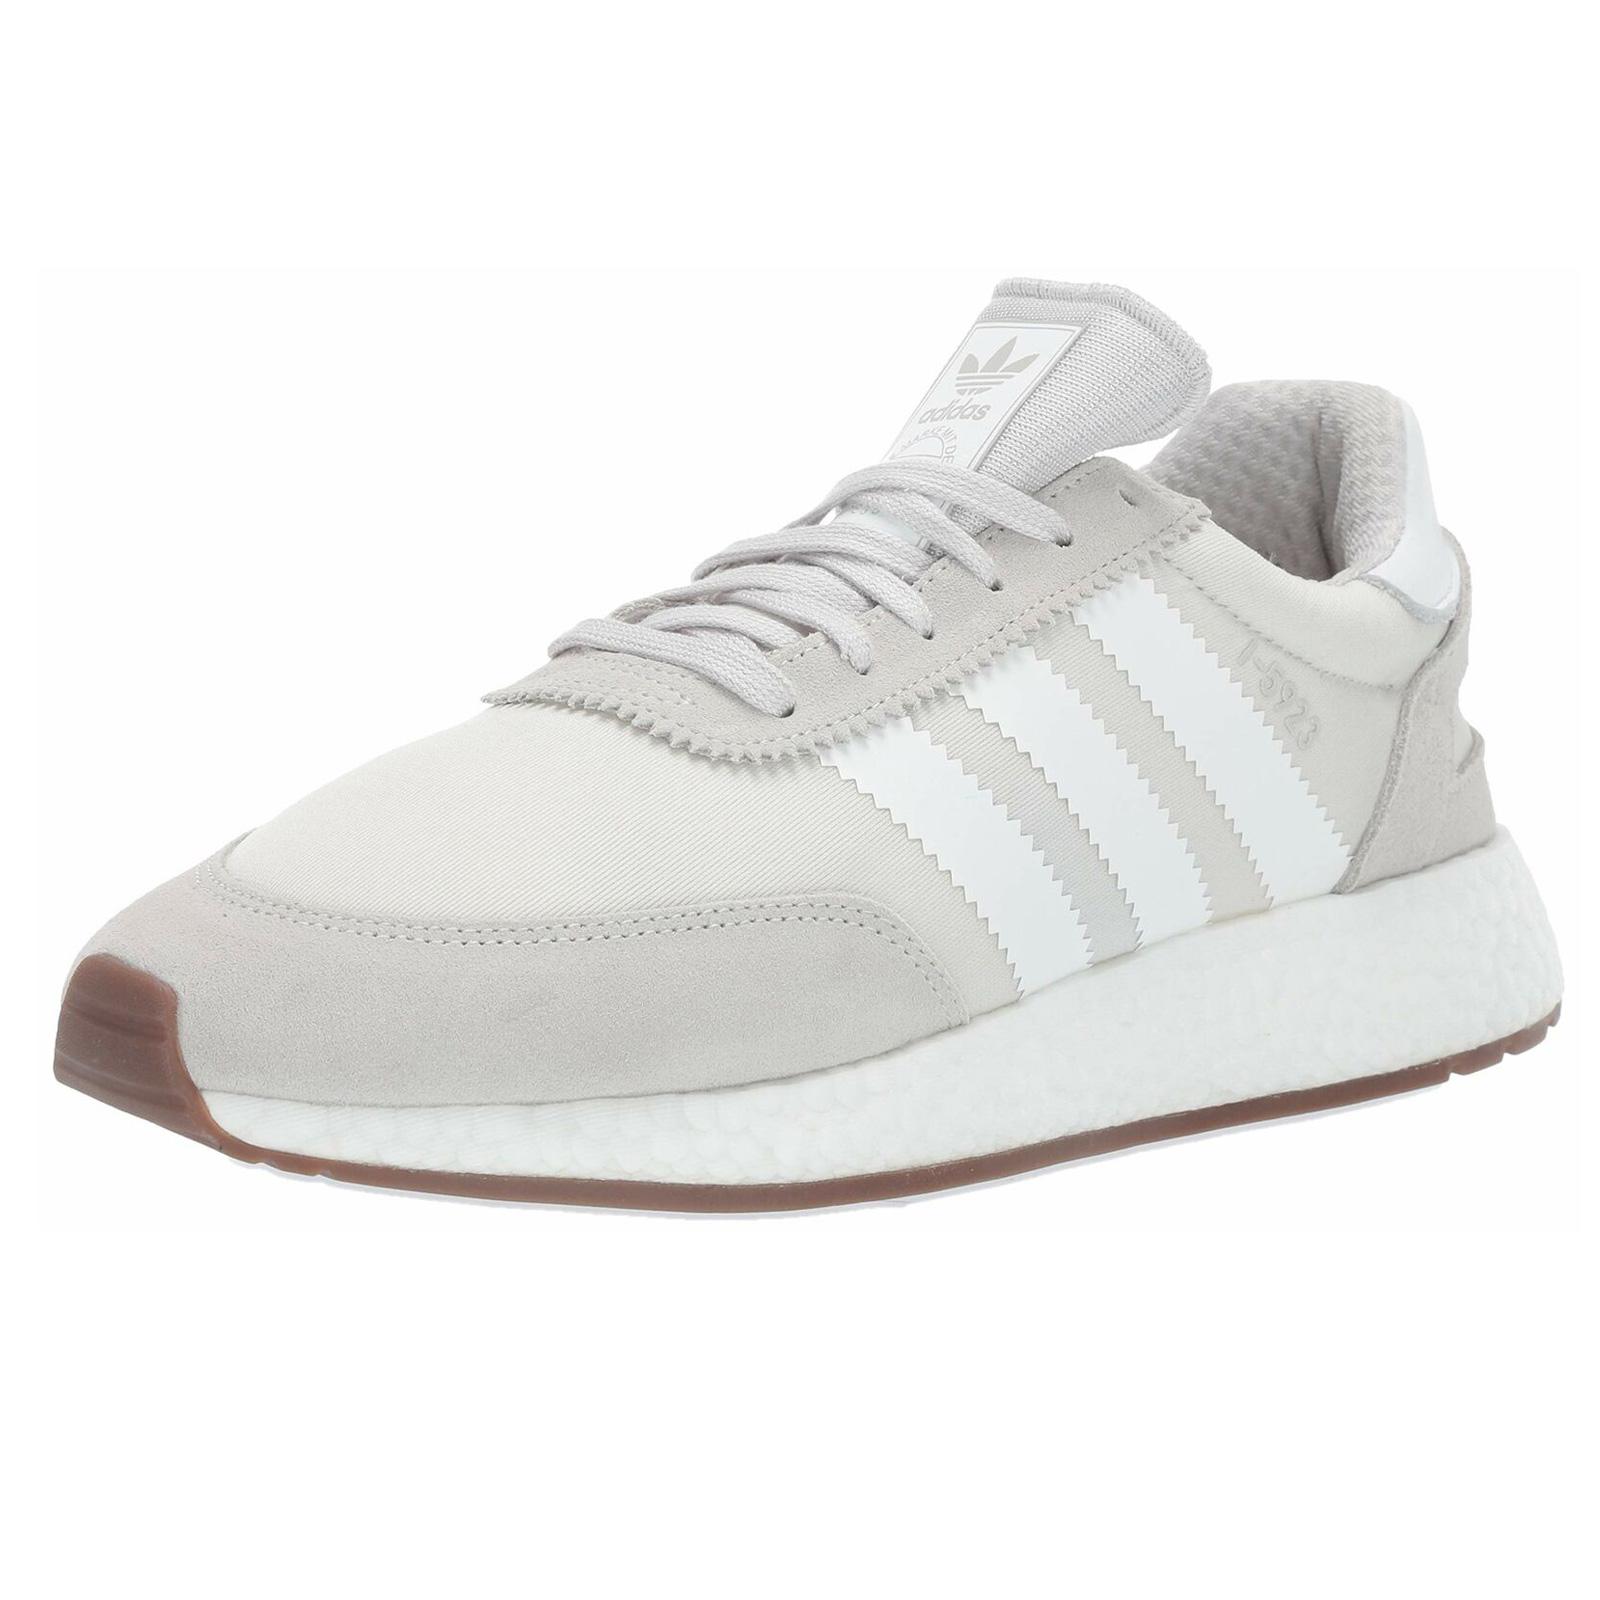 adidas Damen Iniki Runner I 5923 Sneaker Turnschuhe Sportschuhe Vista Grey Grau